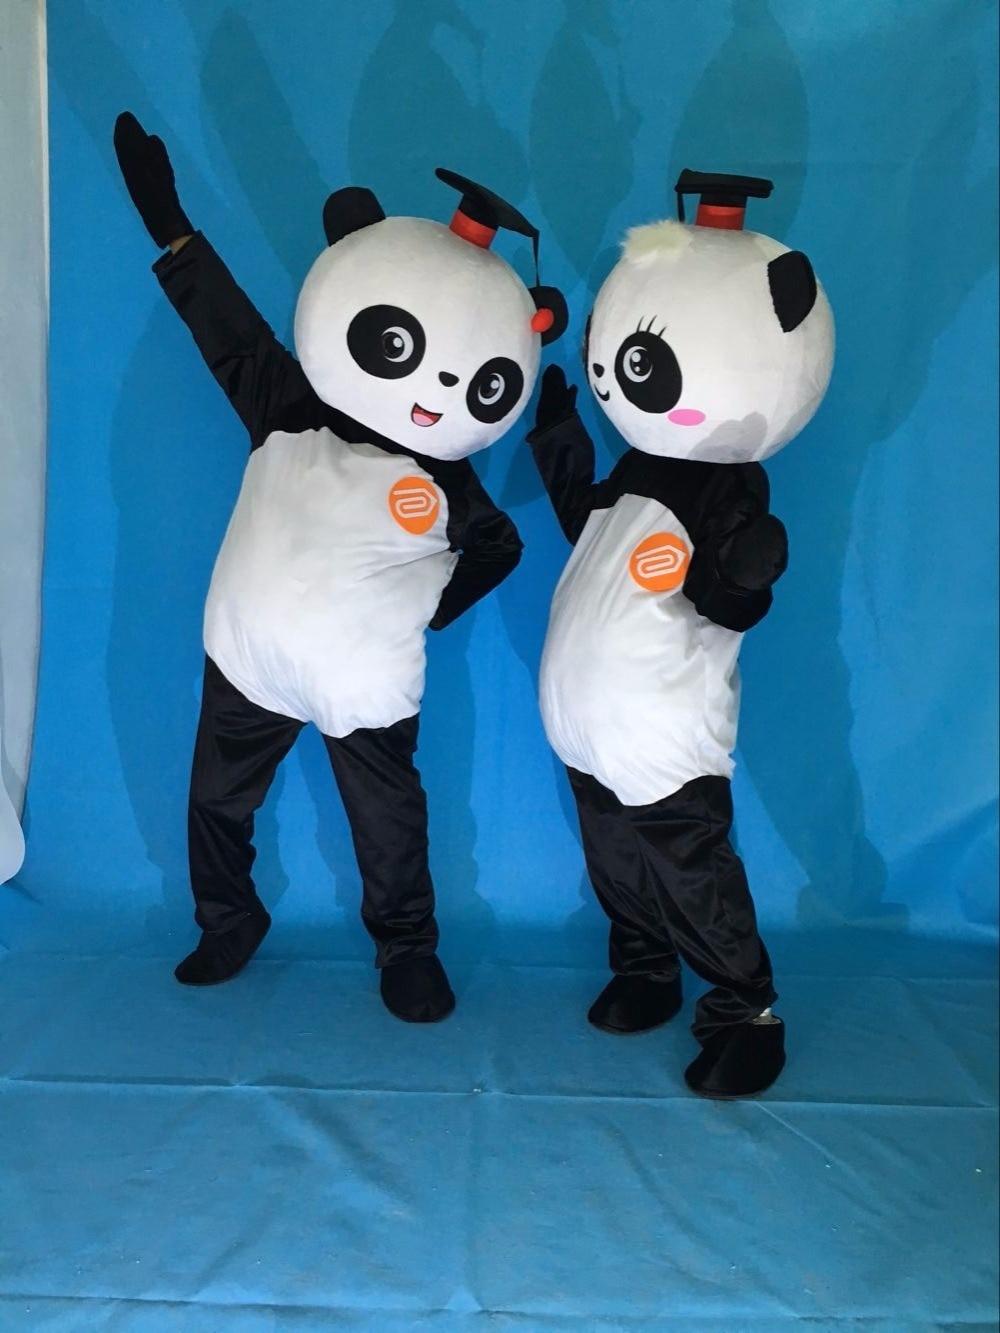 free shipping new kung fu panda mascot costume christmas halloween birthday party bear mascot costume fancy dress adult size - Kung Fu Panda Halloween